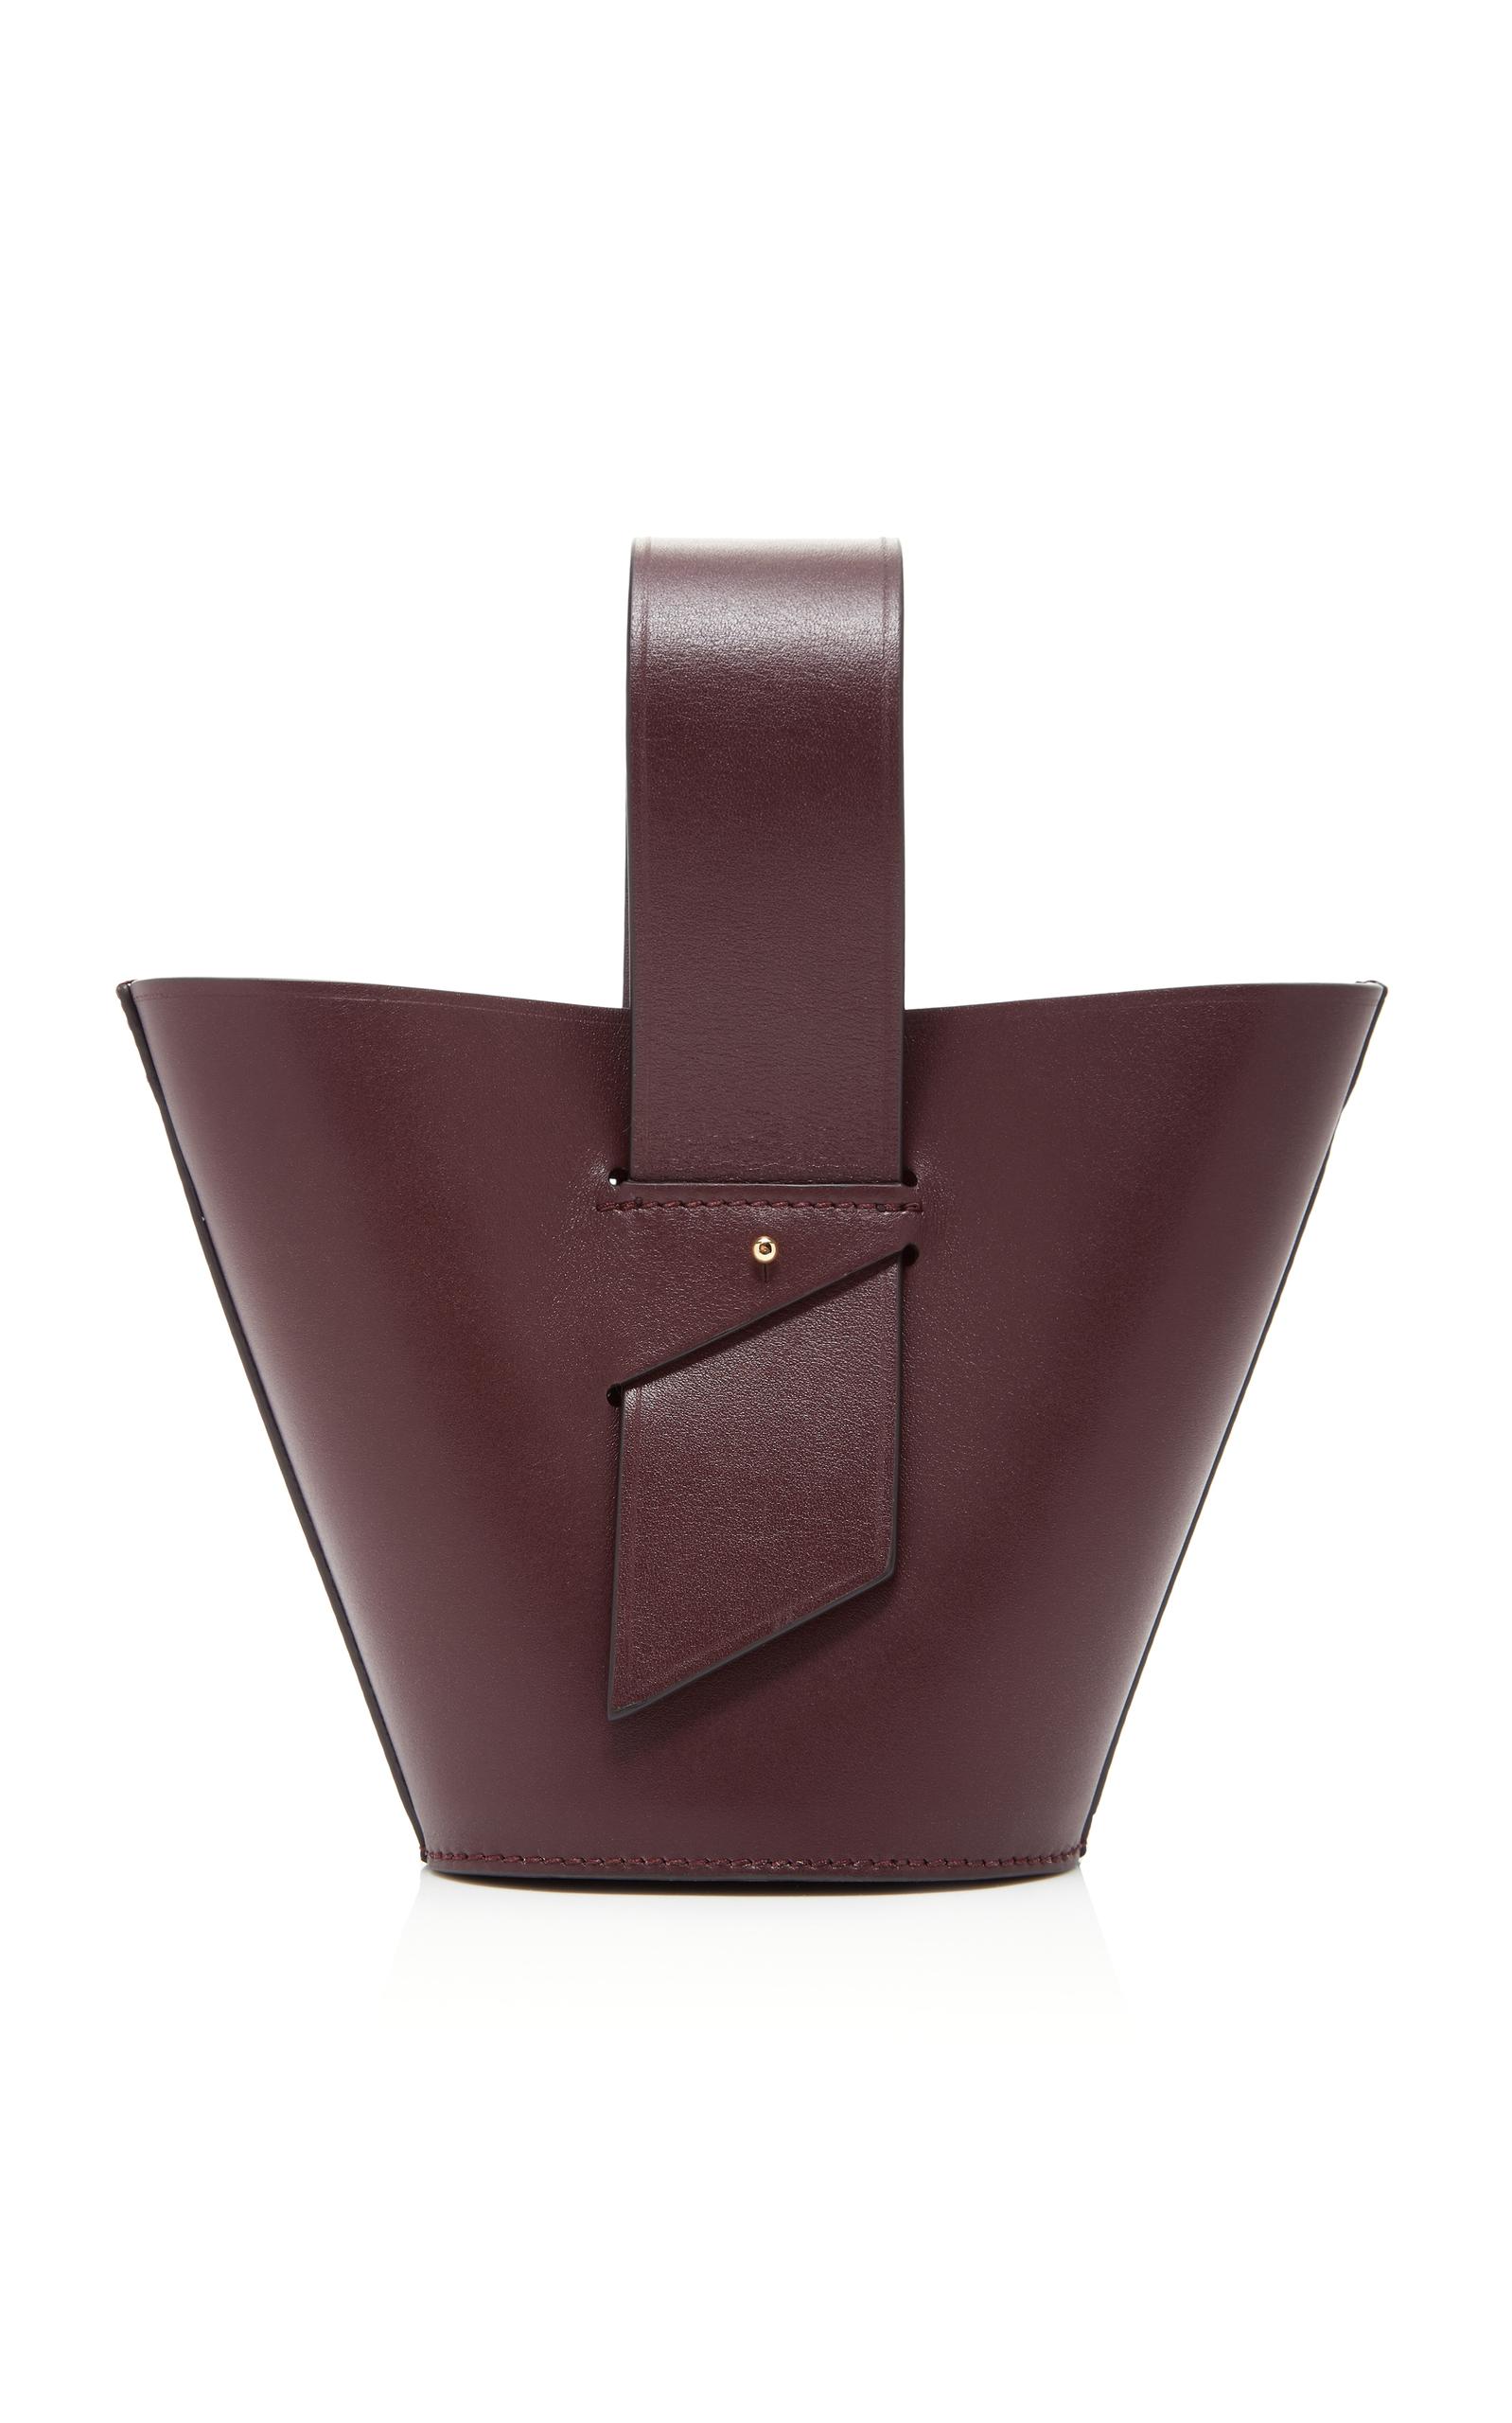 Amphora Leather Top Handle Bag Carolina Santo Domingo 0wHBJBYbKr